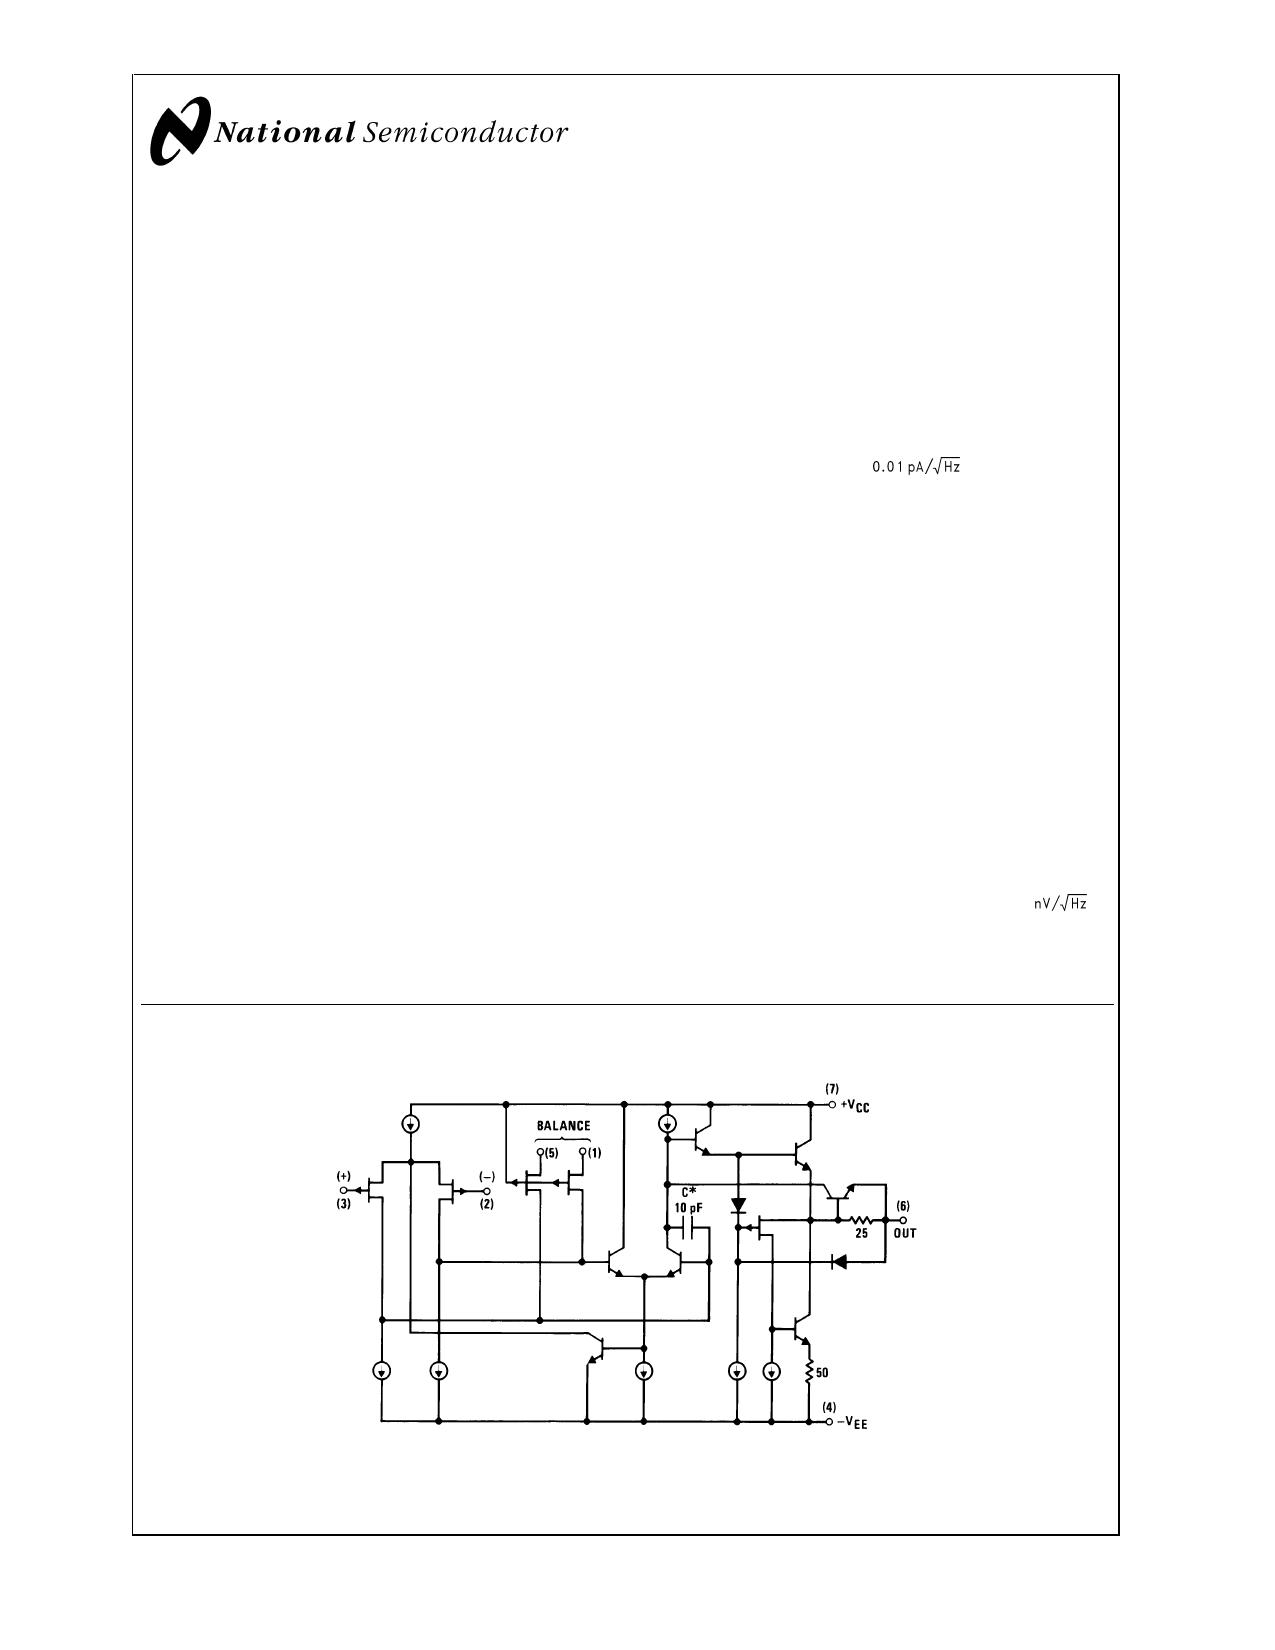 LF256 데이터시트 및 LF256 PDF